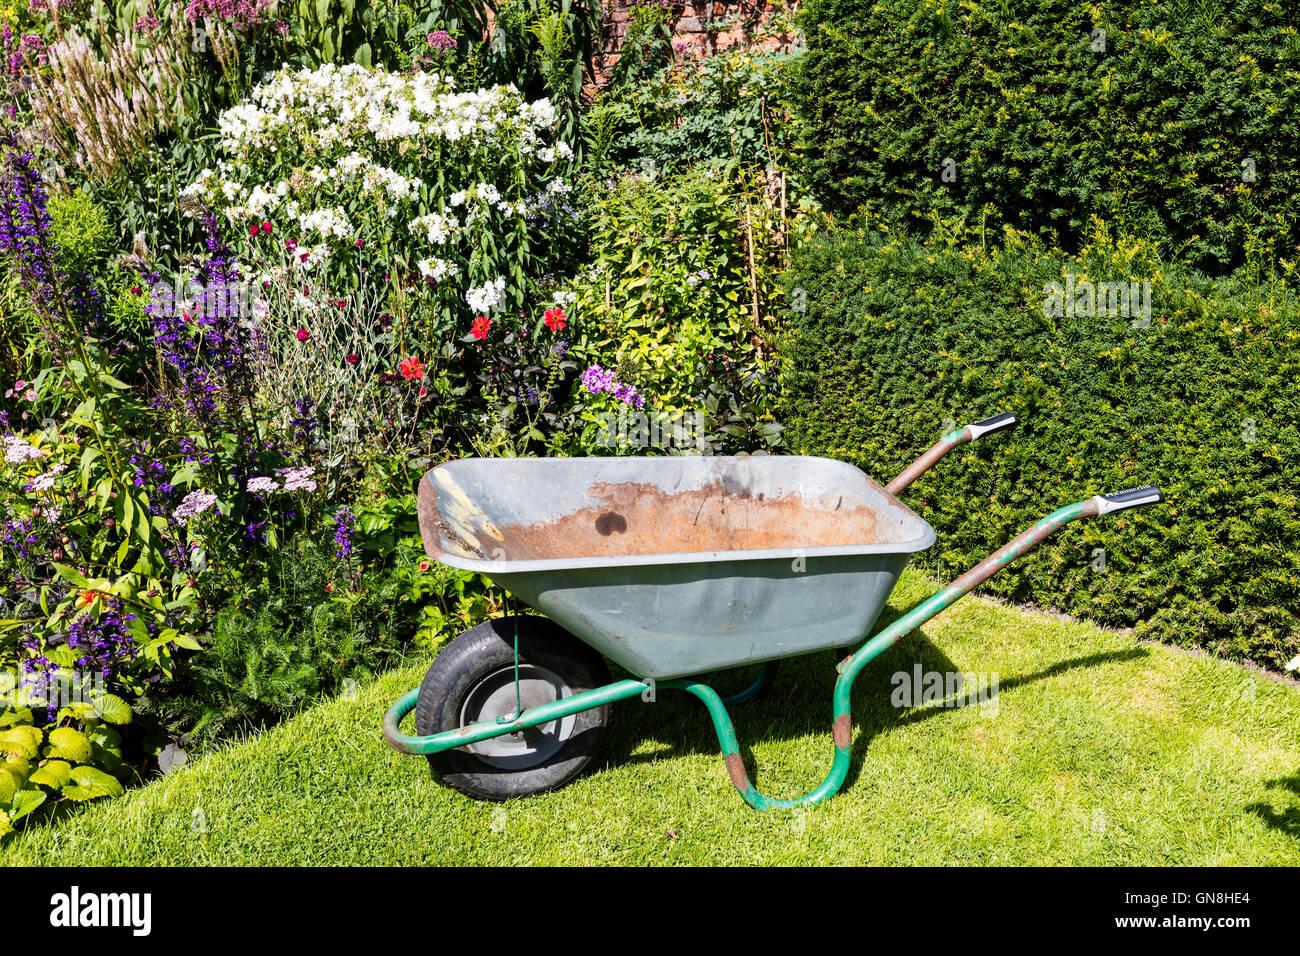 Old well used rusty wheelbarrow in a summer garden. - Stock Image